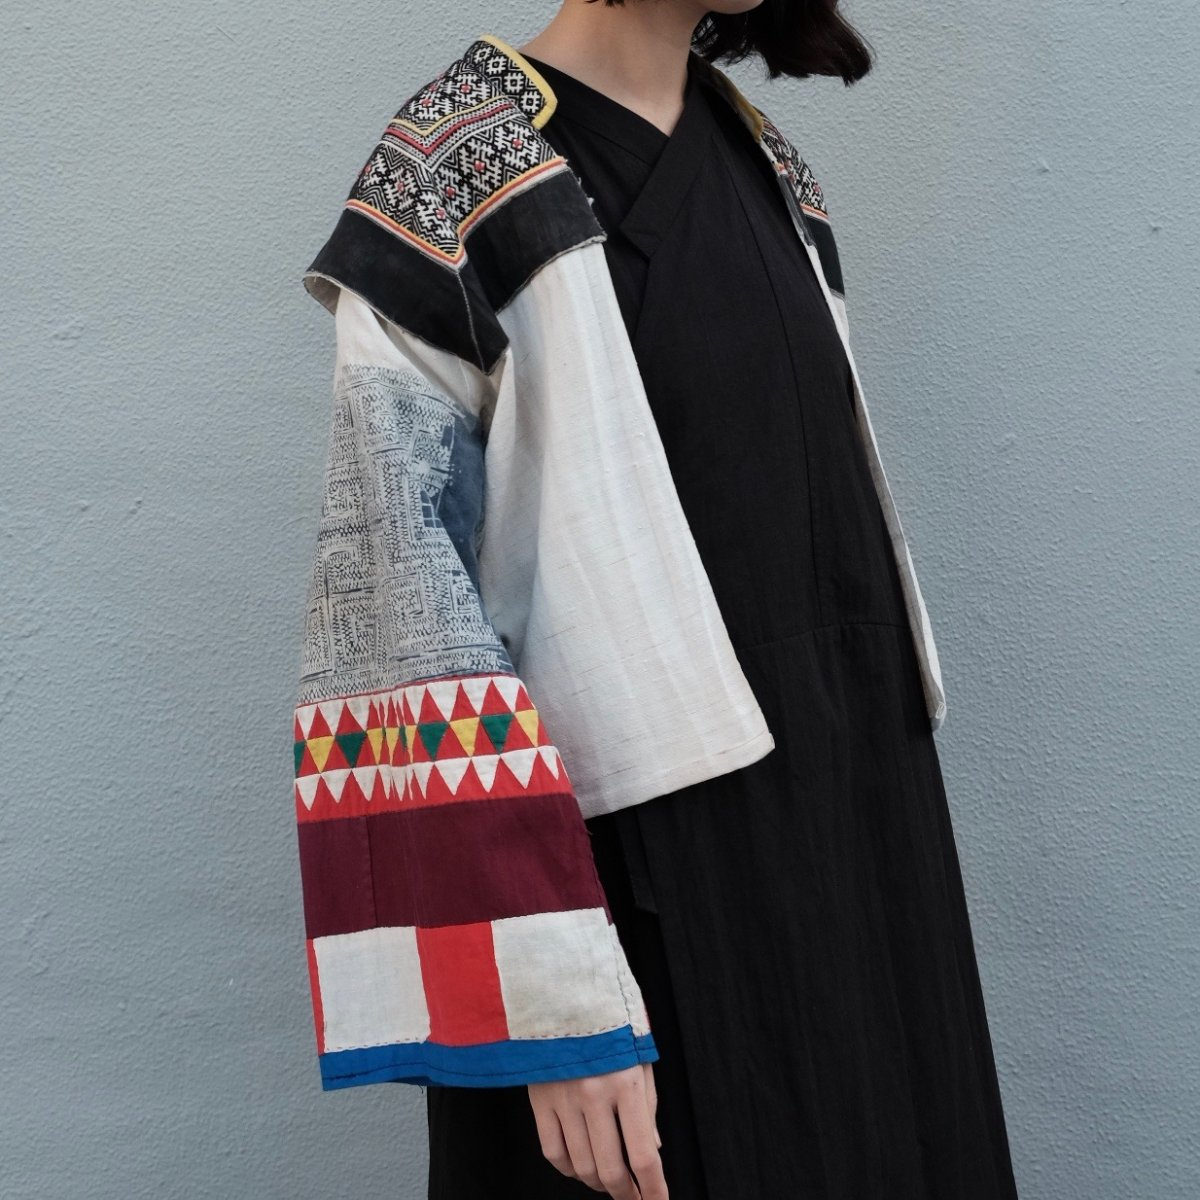 [VINTAGE] Miao Traditional Batik-print Sleeves Jacket by Boinu